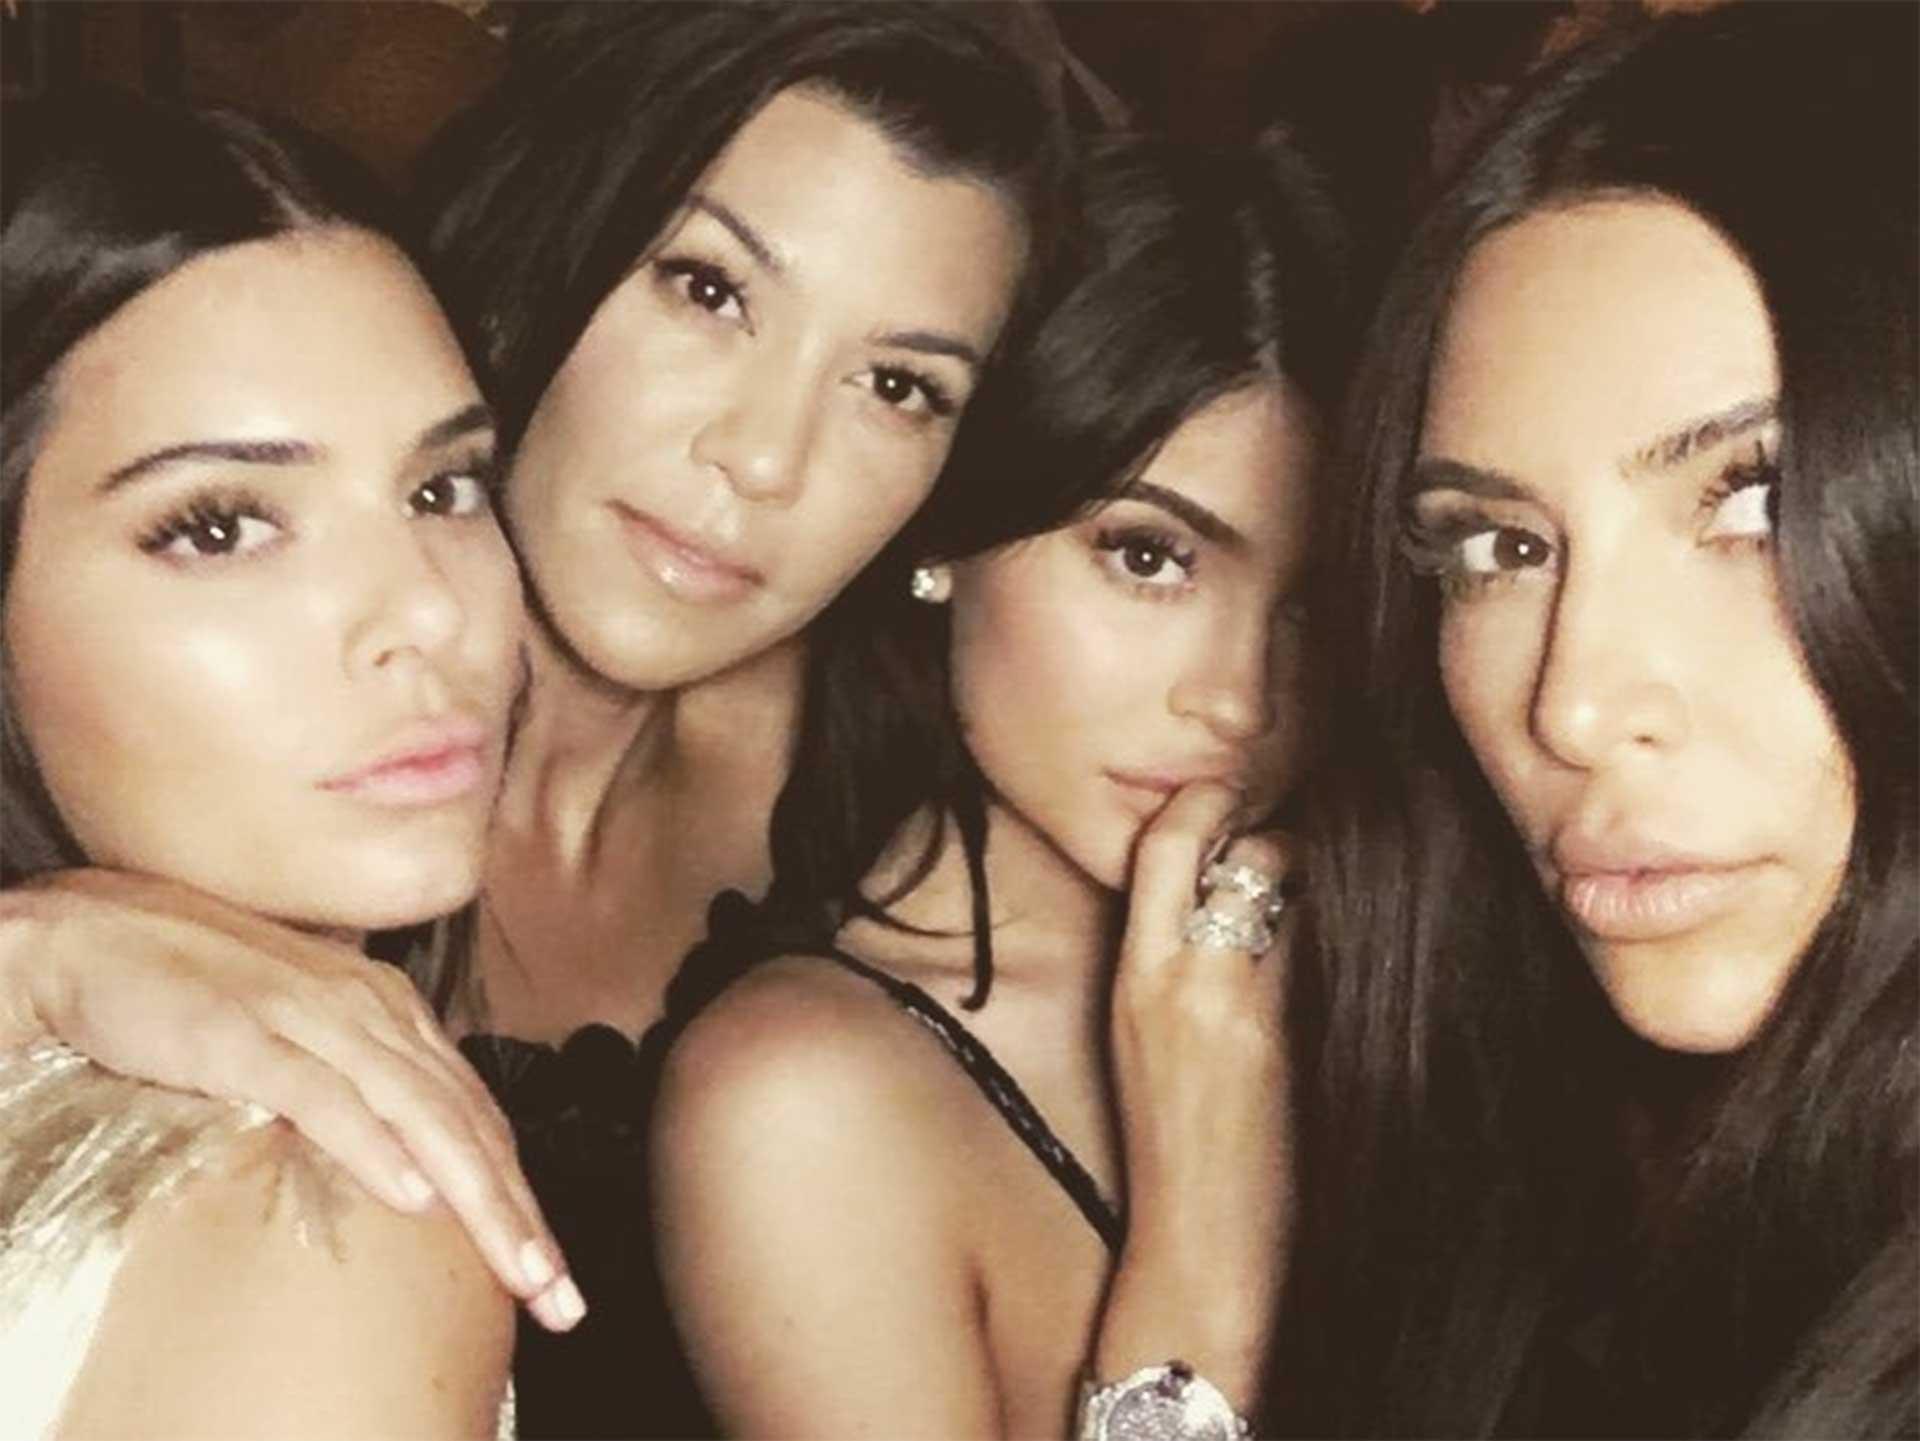 Khloe Kardashian's Boyfriend Tristan Thompson Joins Her at Surprise Birthday Party!